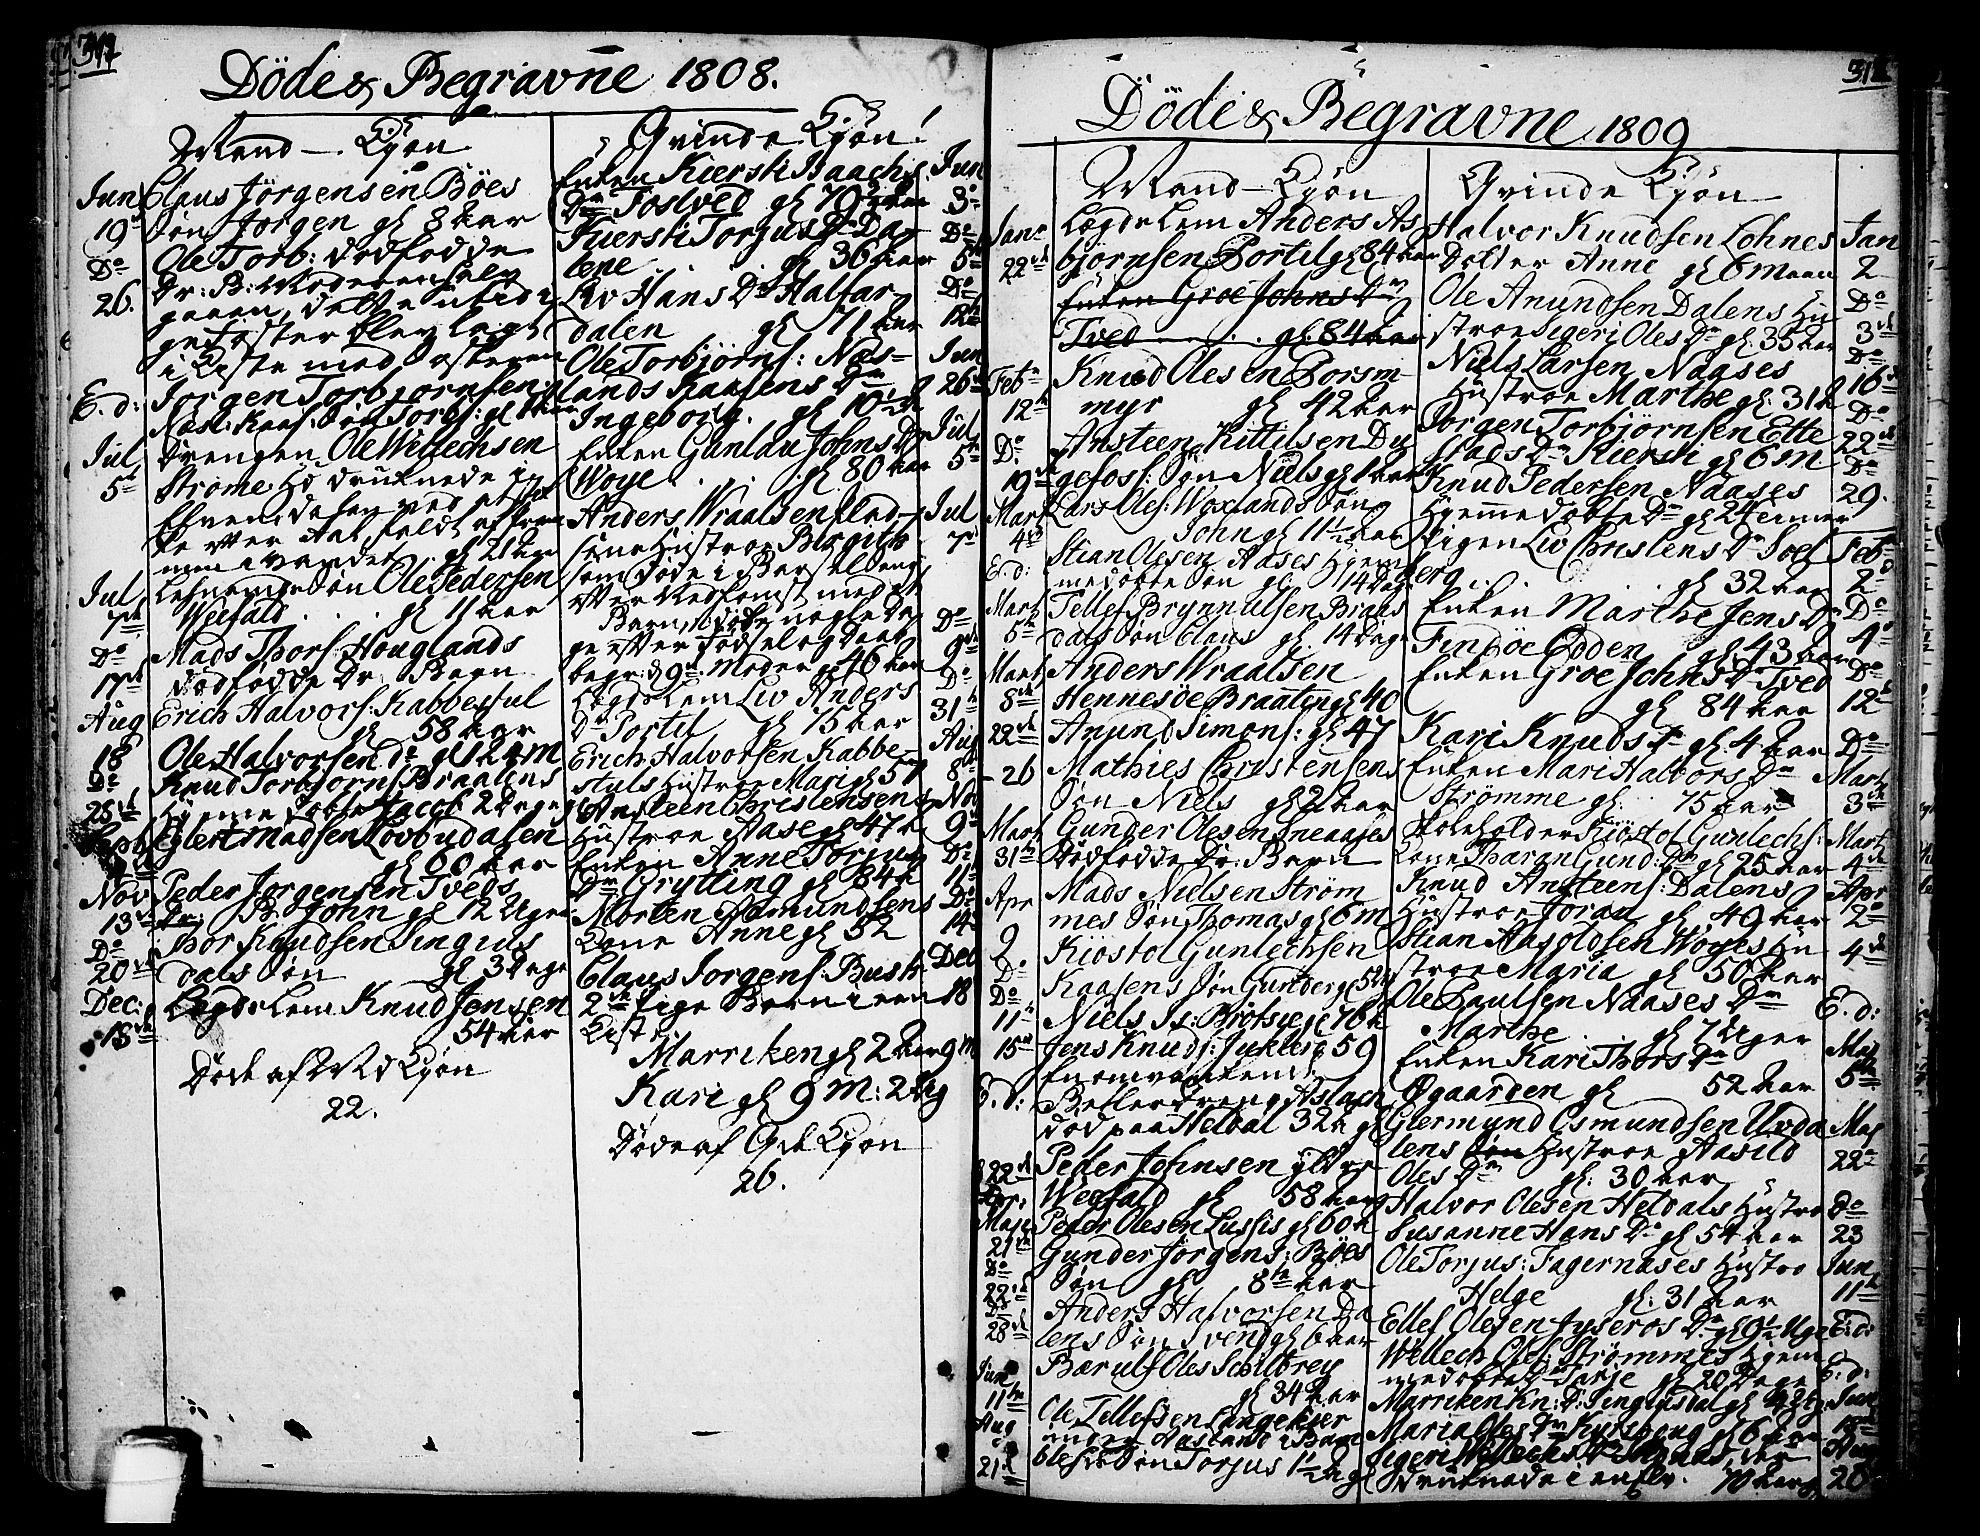 SAKO, Drangedal kirkebøker, F/Fa/L0003: Ministerialbok nr. 3, 1768-1814, s. 311-312